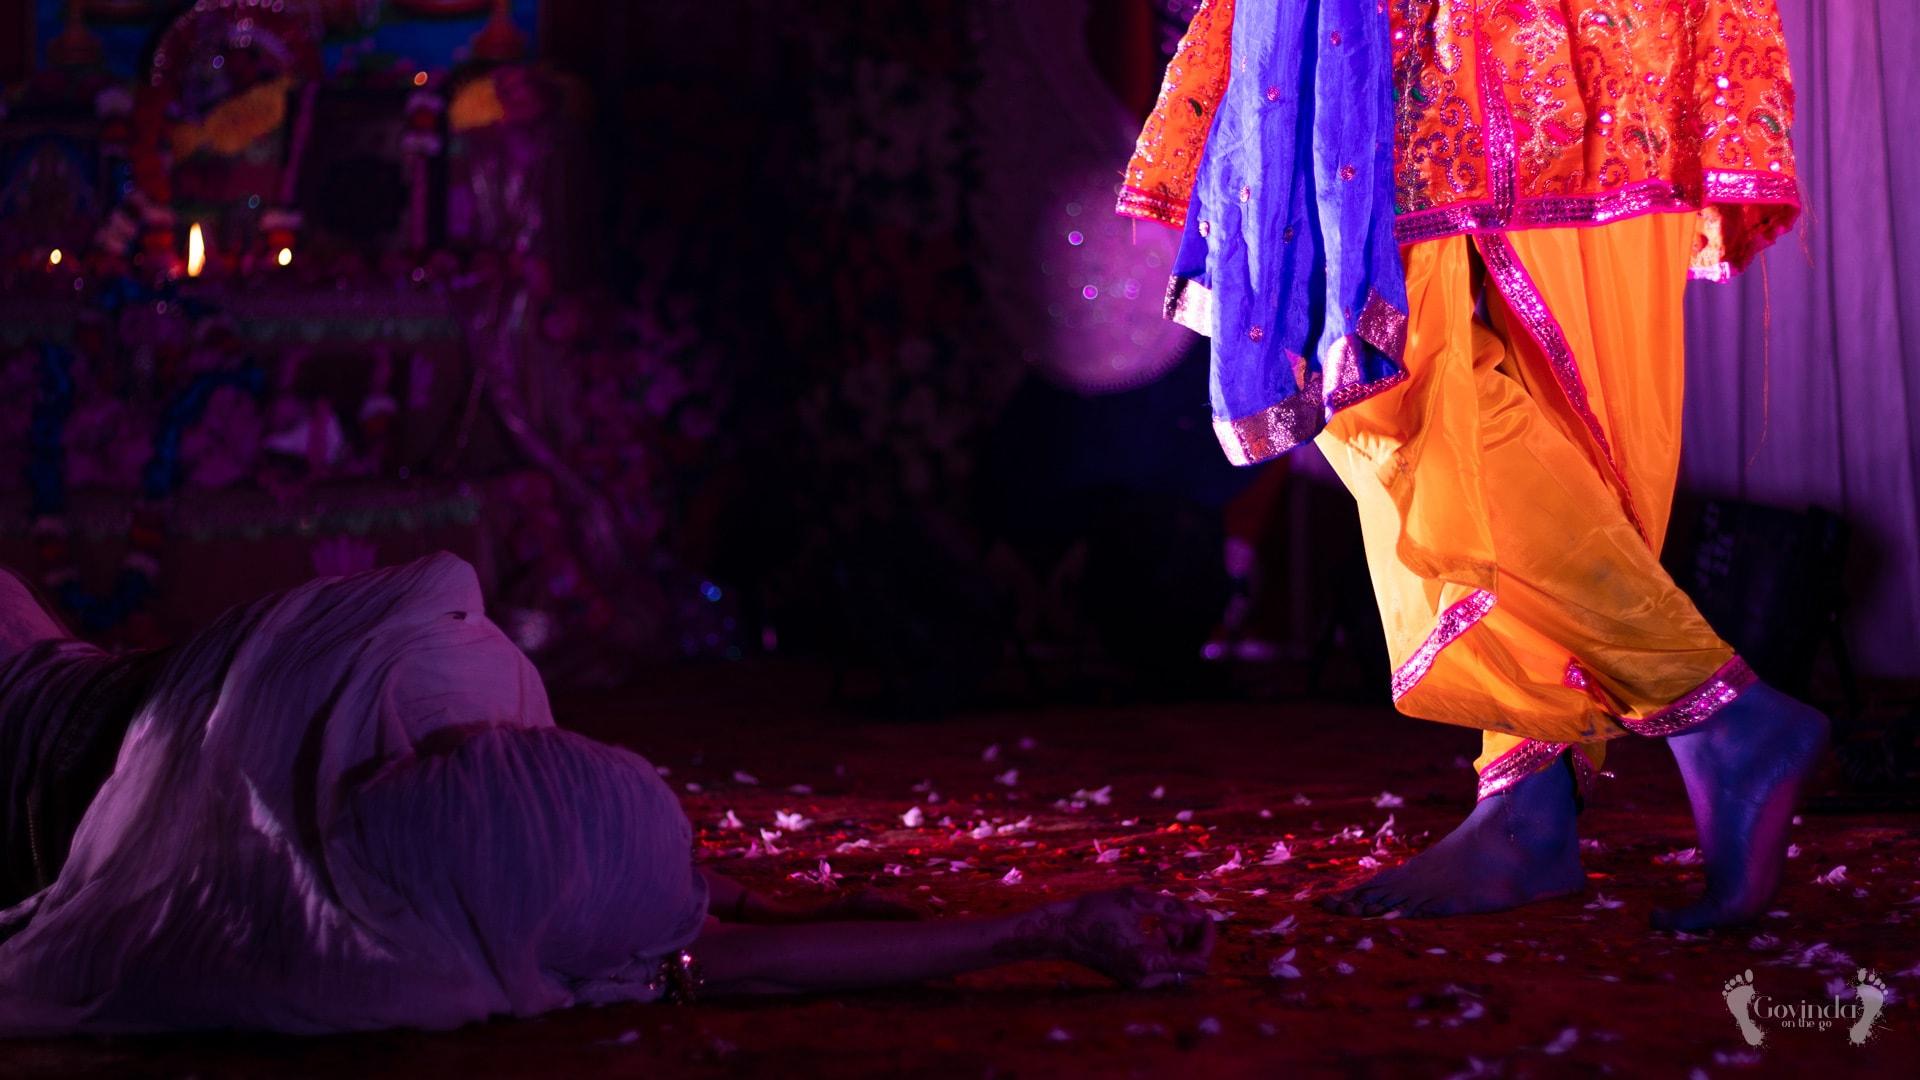 Meerabai theatre play during Karthik night celebrations